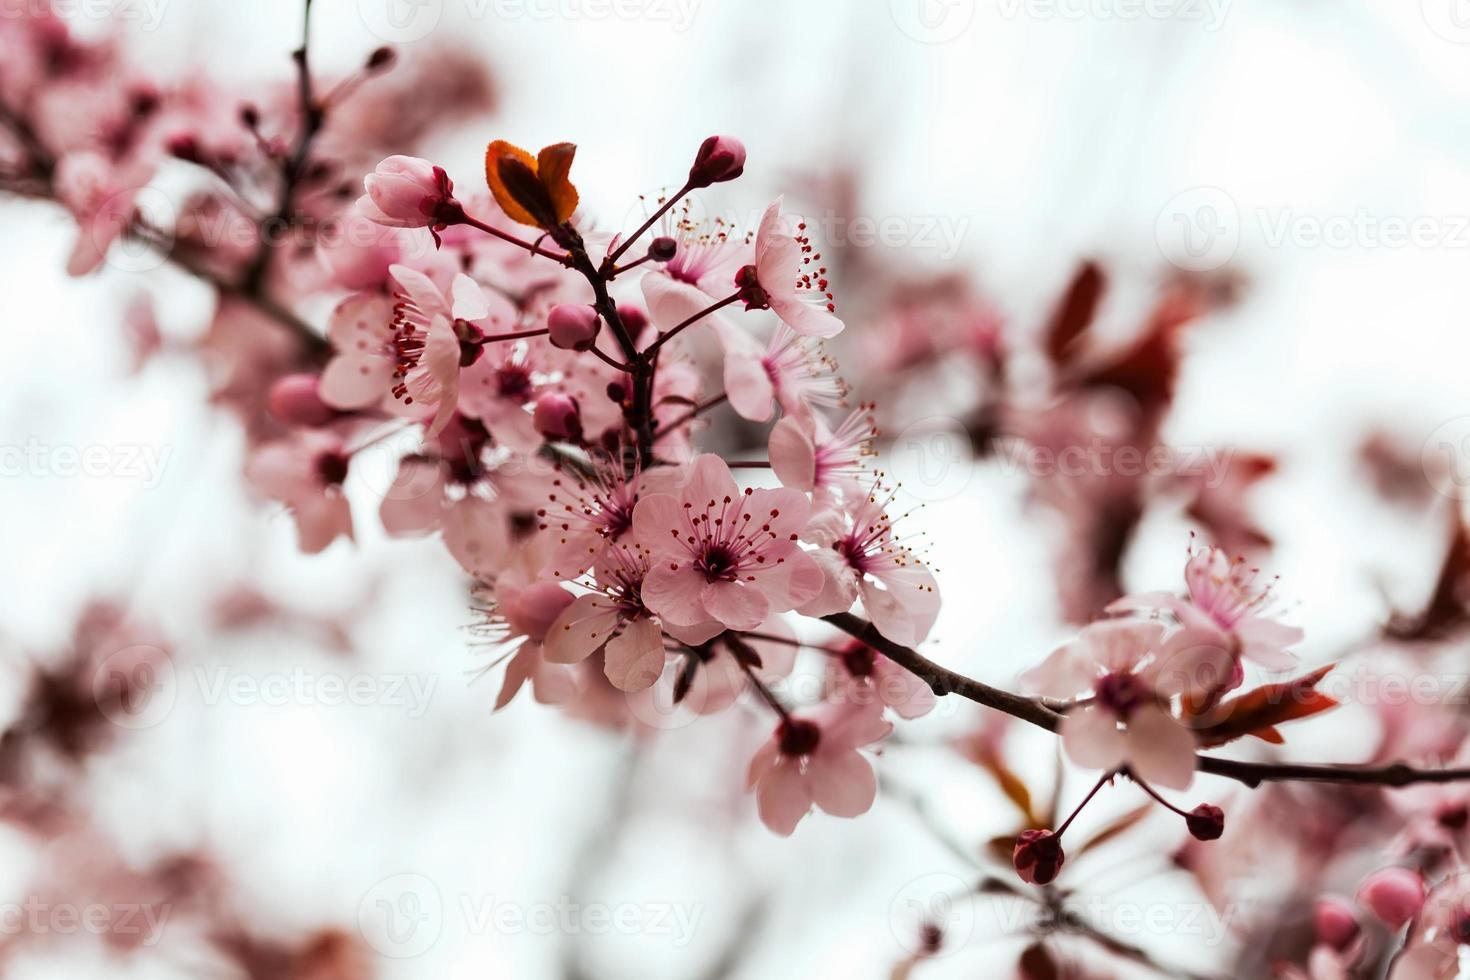 rama de almendro con flores foto